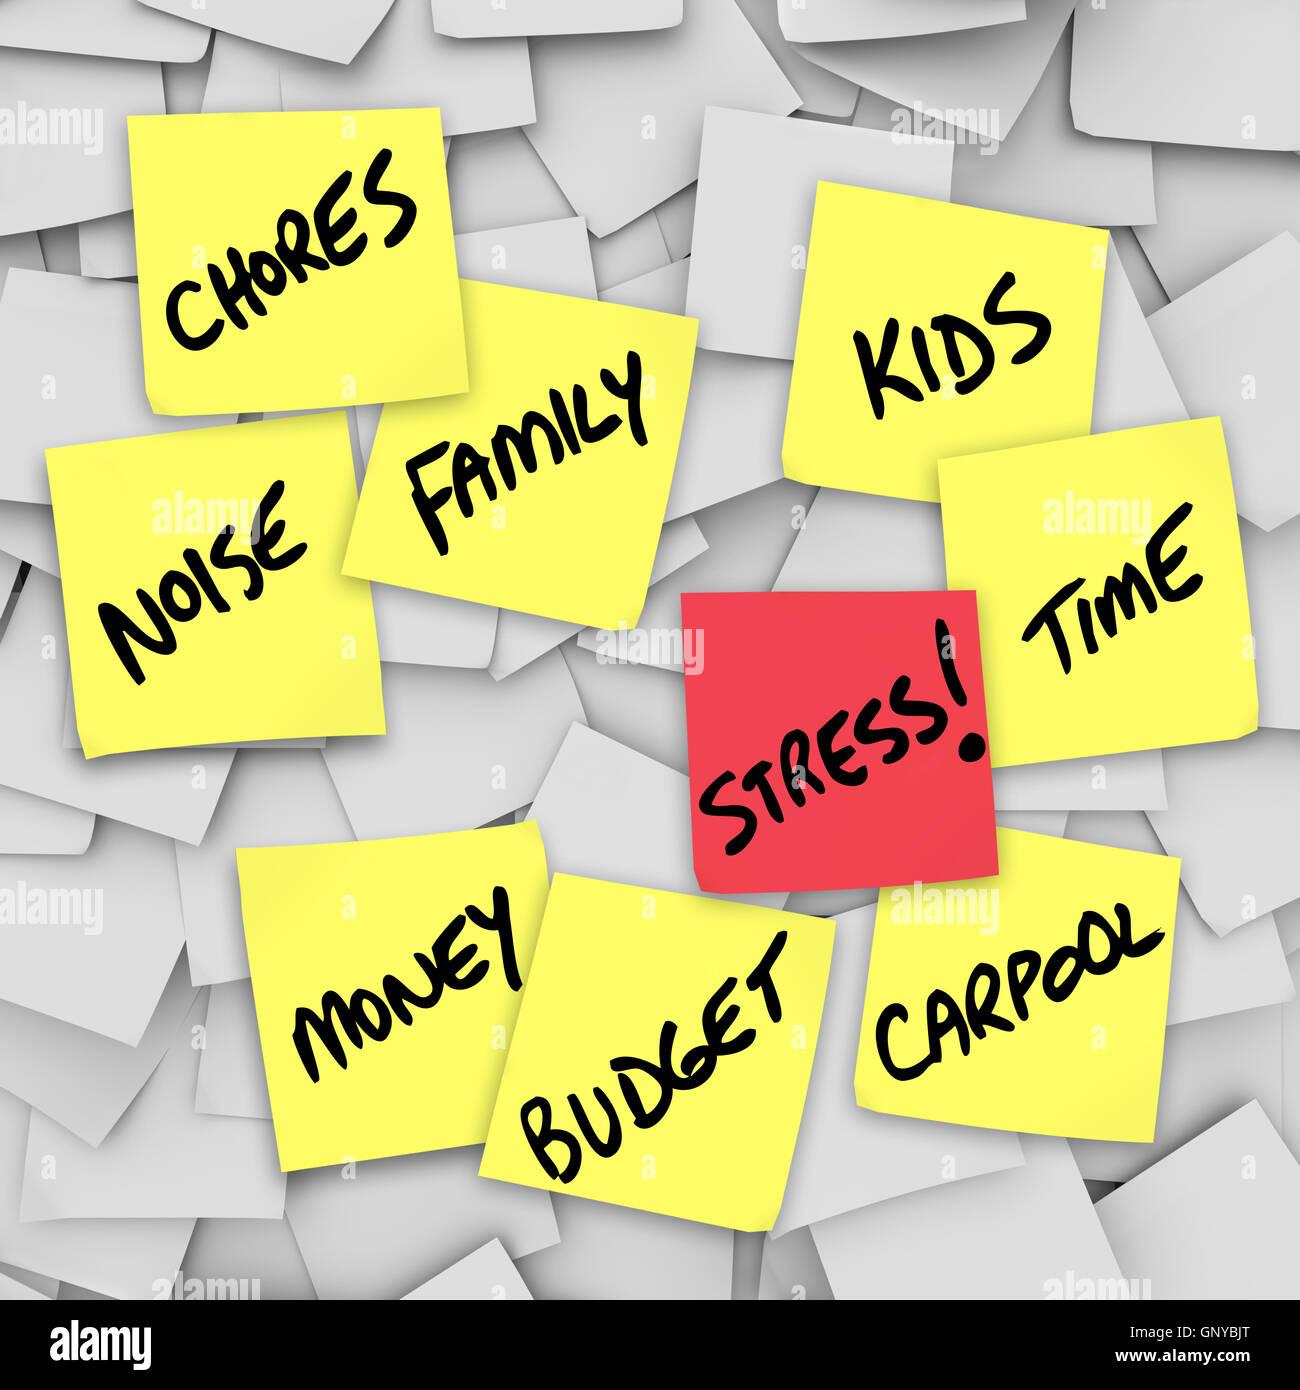 Cargas de estrés Sticky Notes recordatorios de vida estresante Imagen De Stock